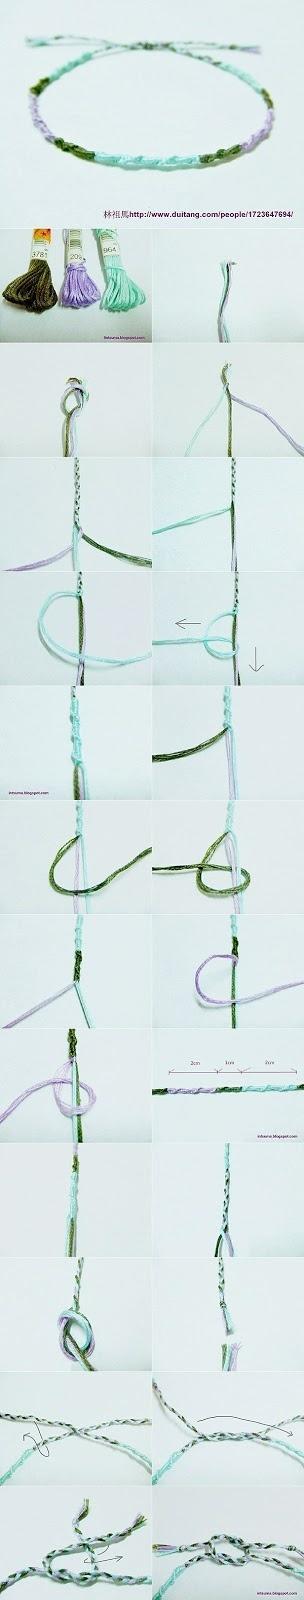 How to Make a Macrame Bracelet